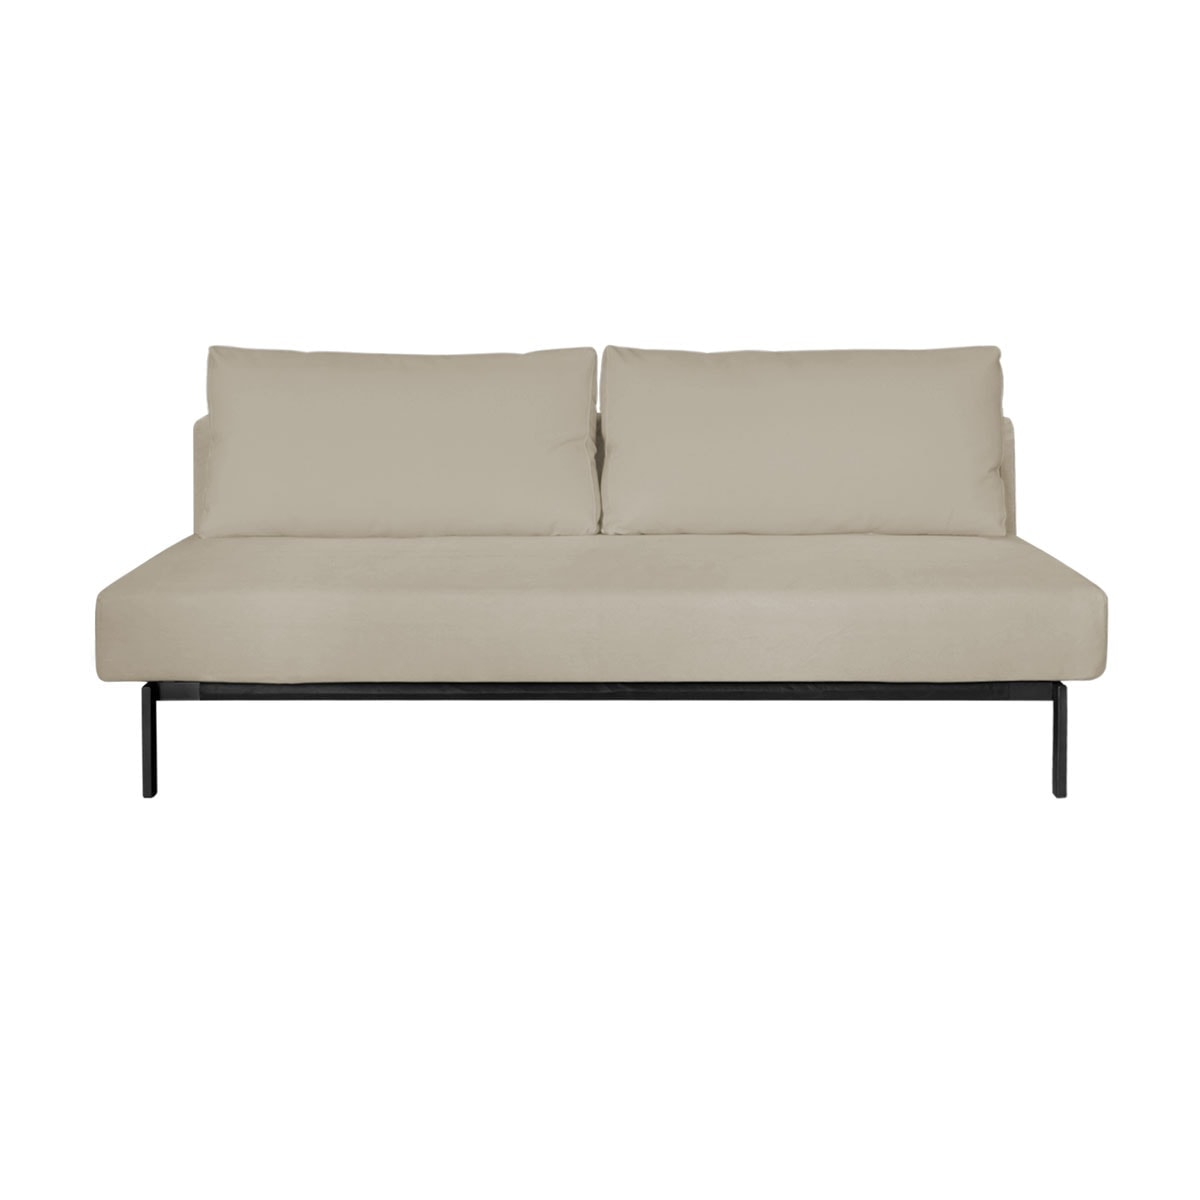 Sofa para sala futon company - Sofa cama madrid ...